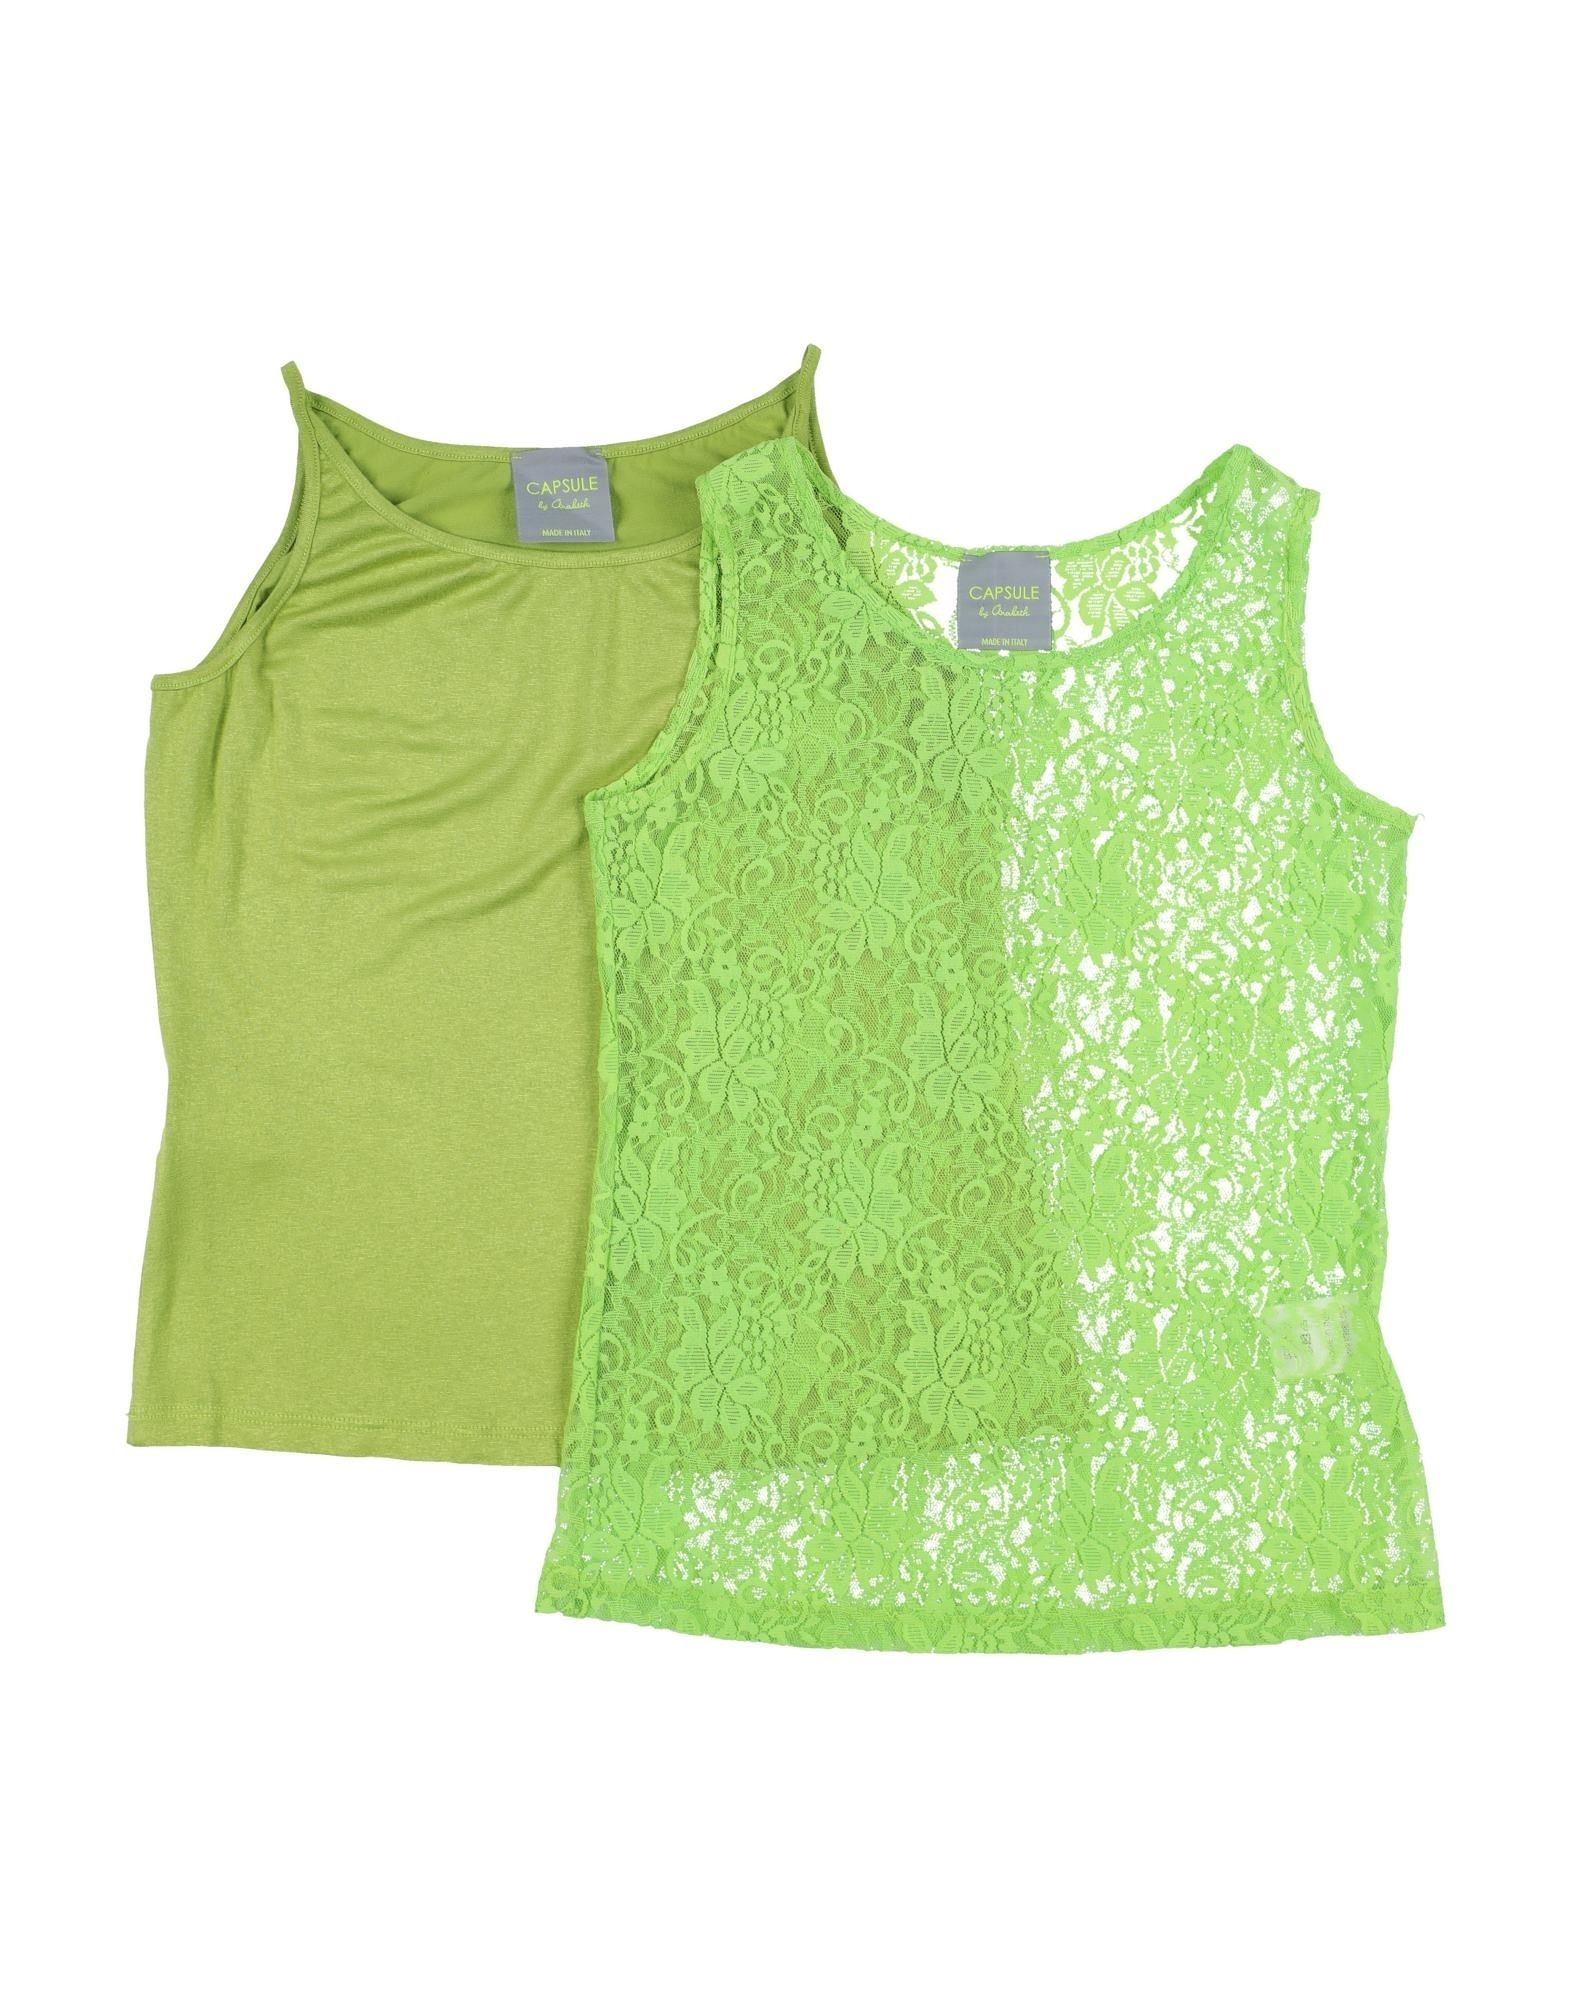 Capsule By Arabeth Kids' T-shirts In Green